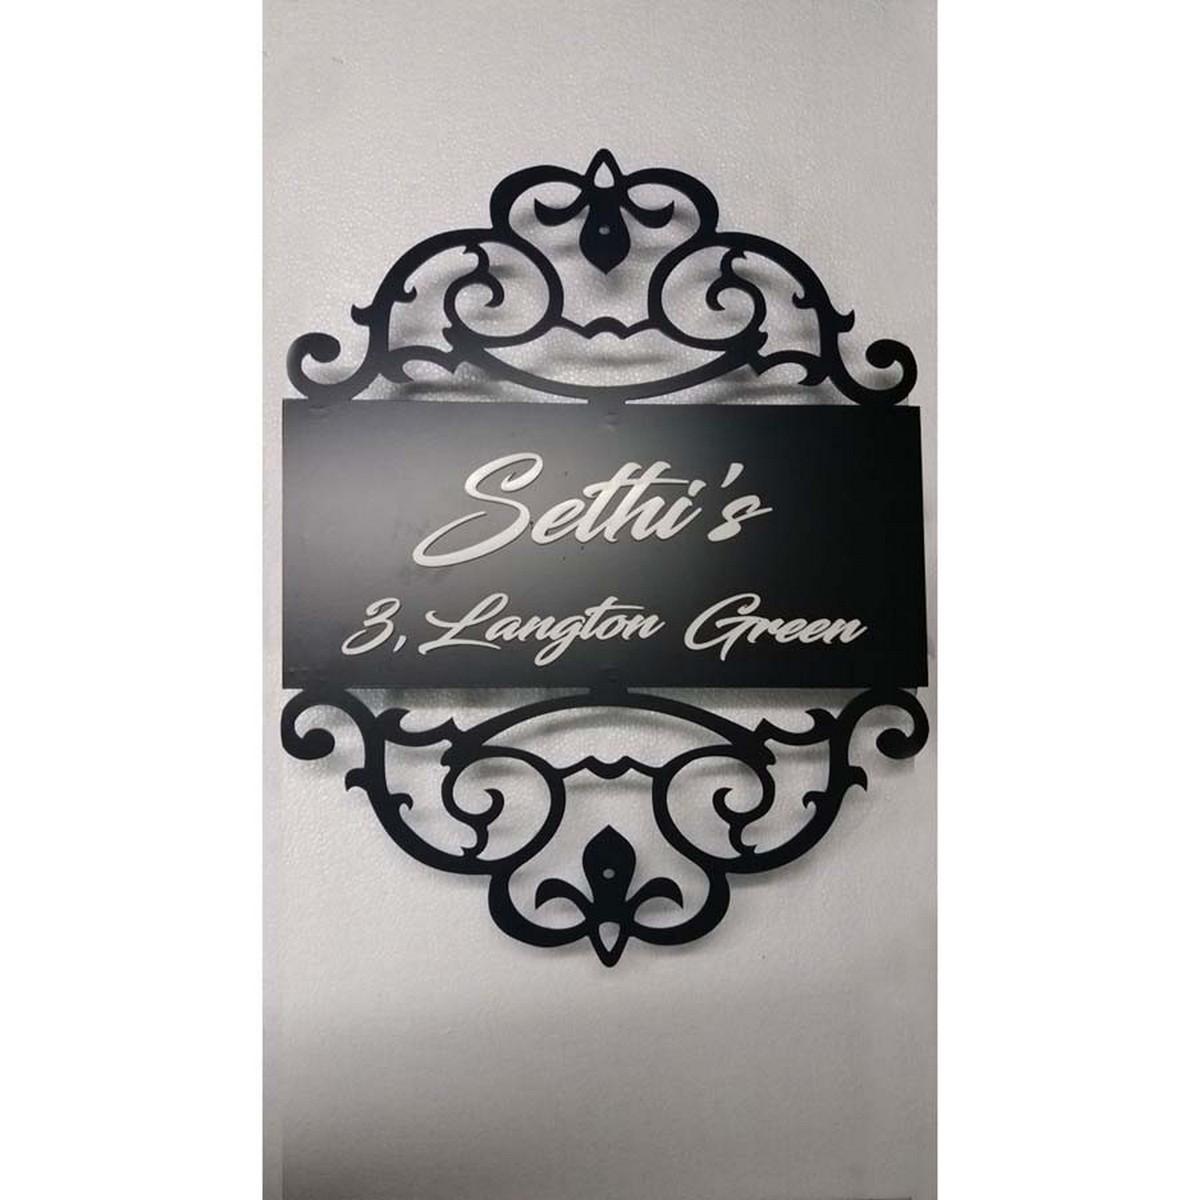 Sethis  Light Name Plate  Mild Steel + Acrylic  Sethis  Name Plate